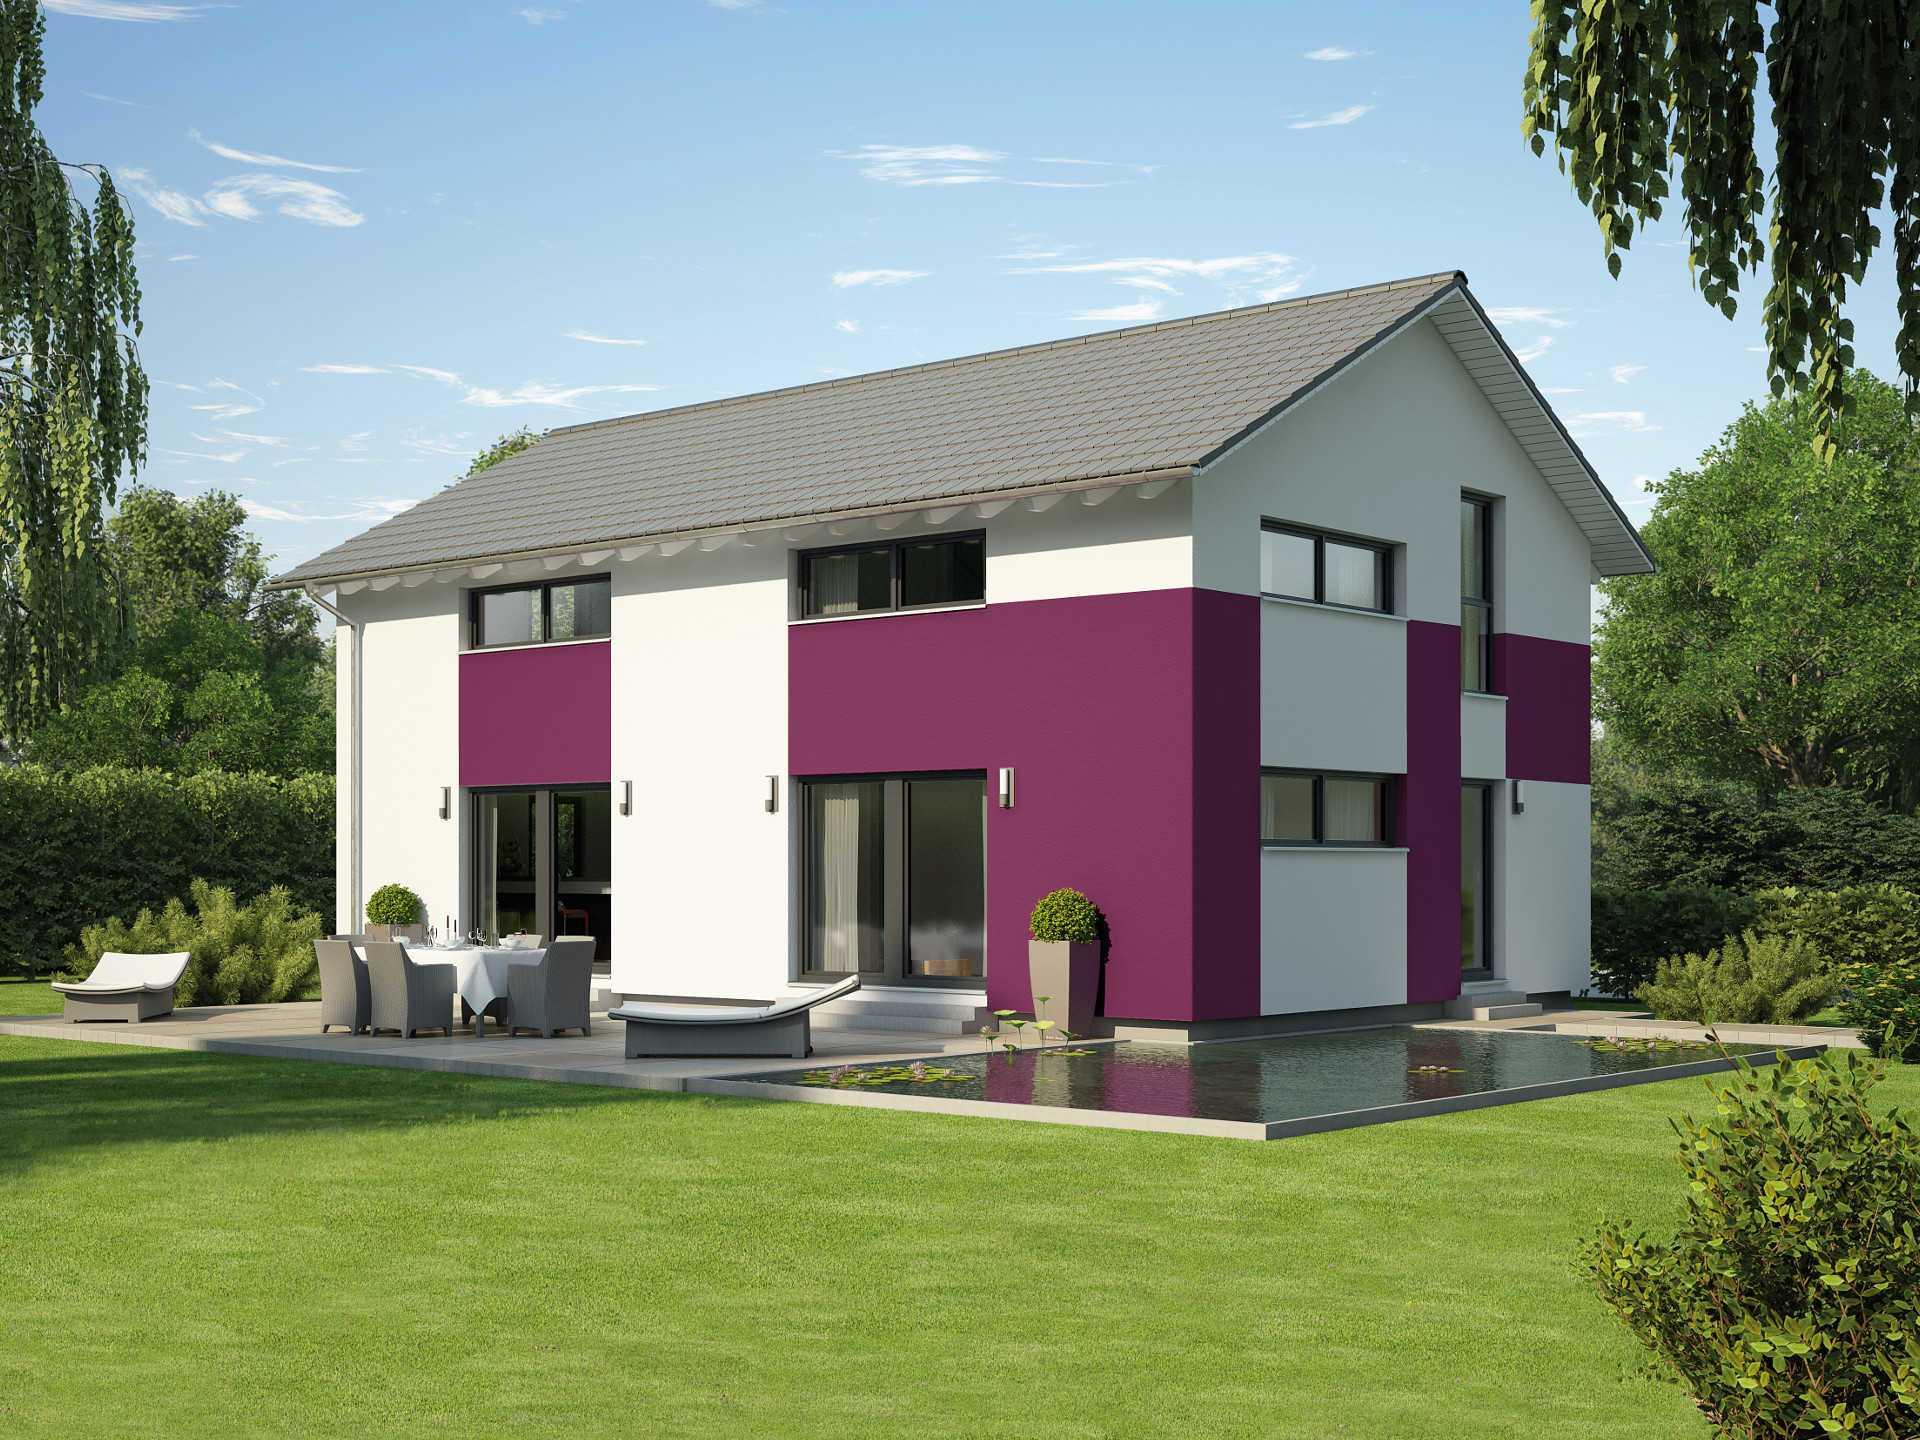 Hausentwurf satteldachhaus okal haus for Moderner baustil einfamilienhaus